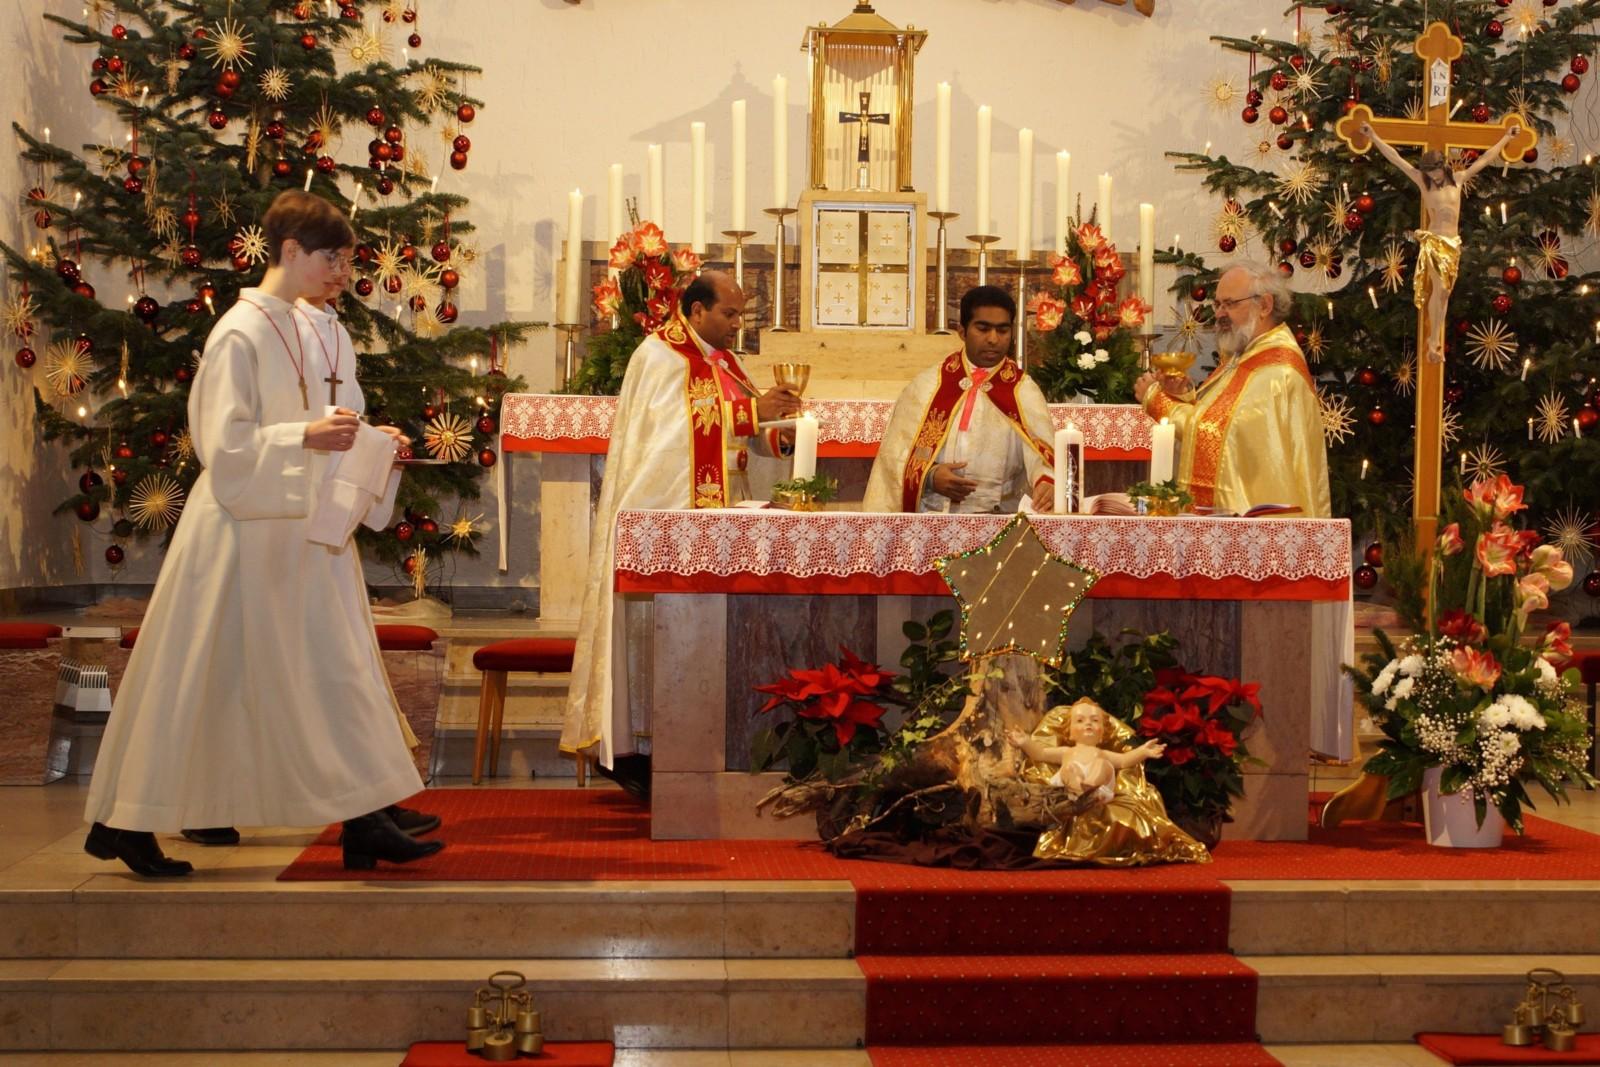 20181230-10 Jahre Priester Joseph DSC03758